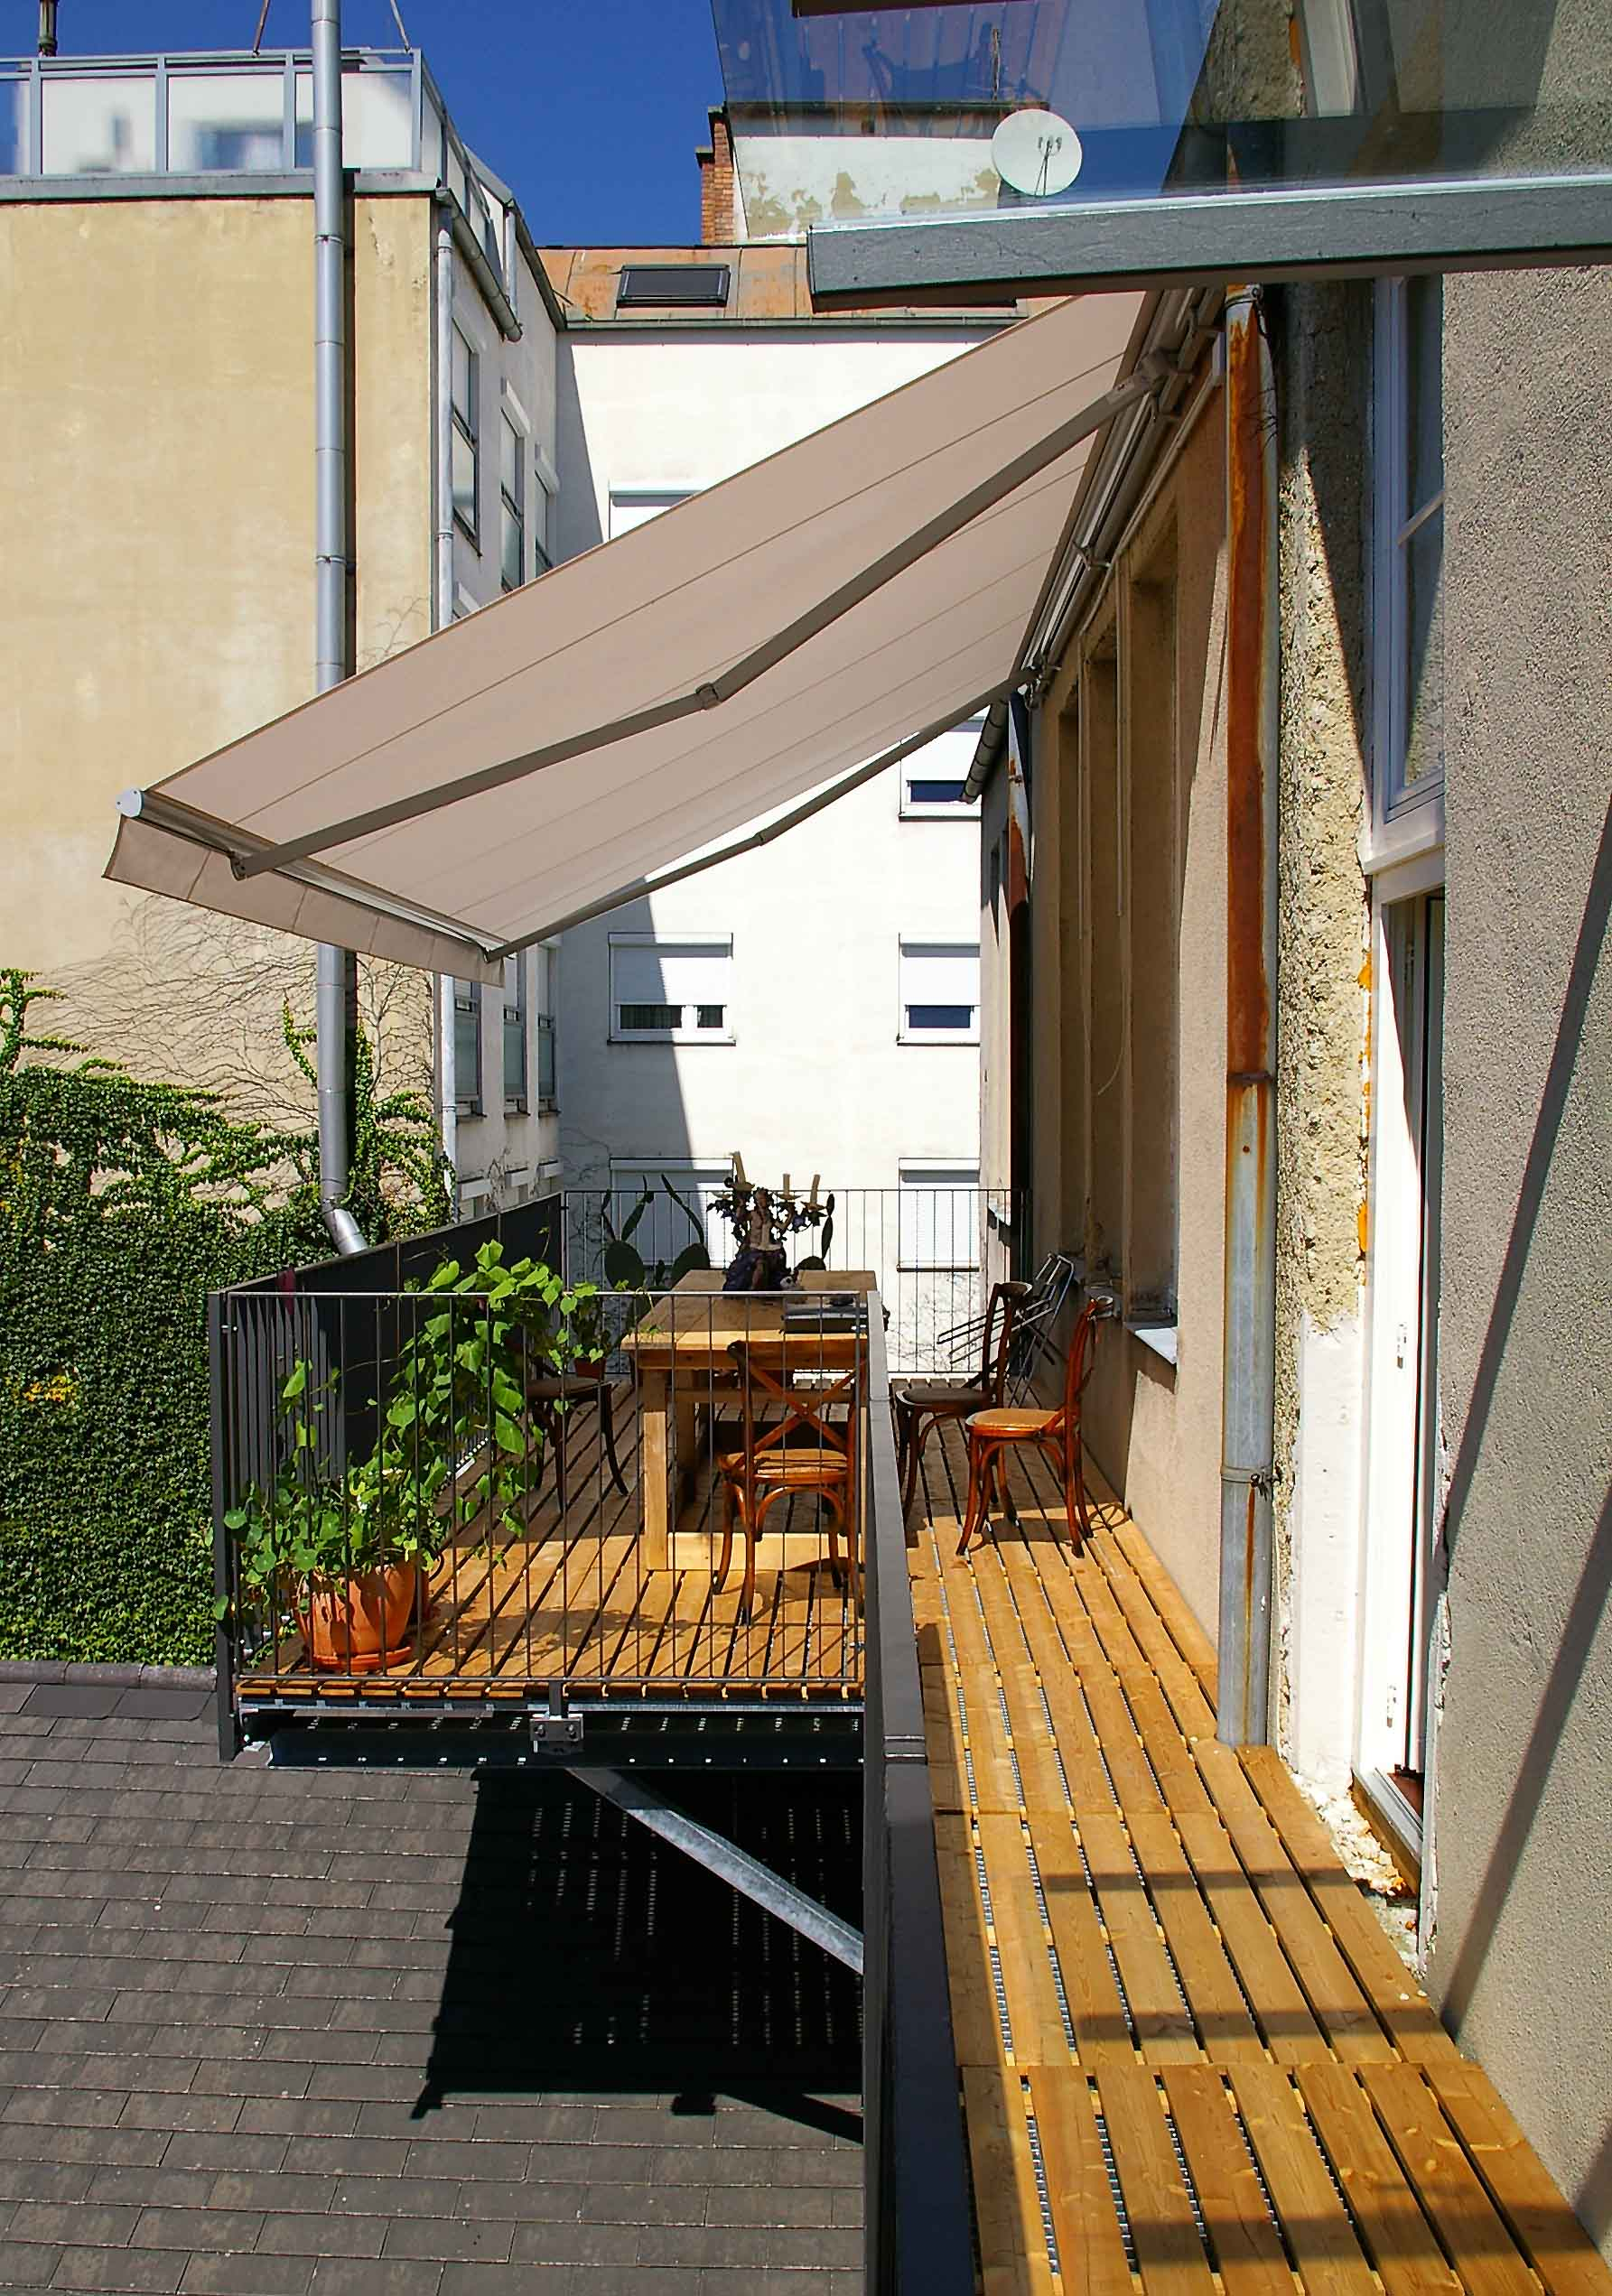 GL1134_Balkonkonstruktion_mit_Holzrost1